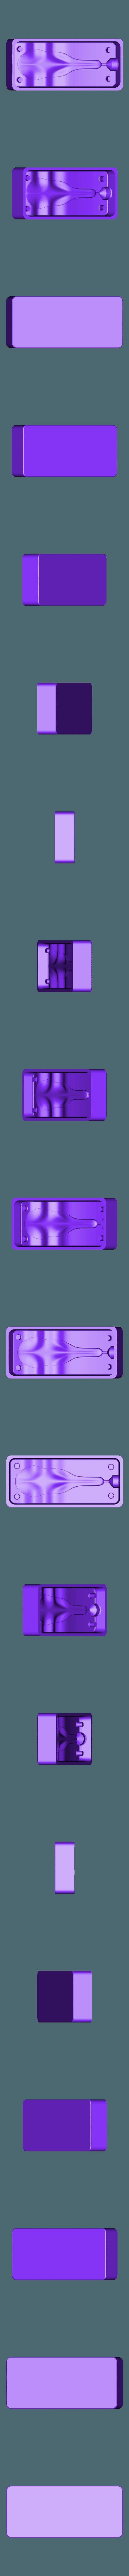 Cuttlefish Reaper Top Mold Master.stl Download STL file The Cuttlefish Reaper Fishing Lure Mold • 3D printable model, sthone